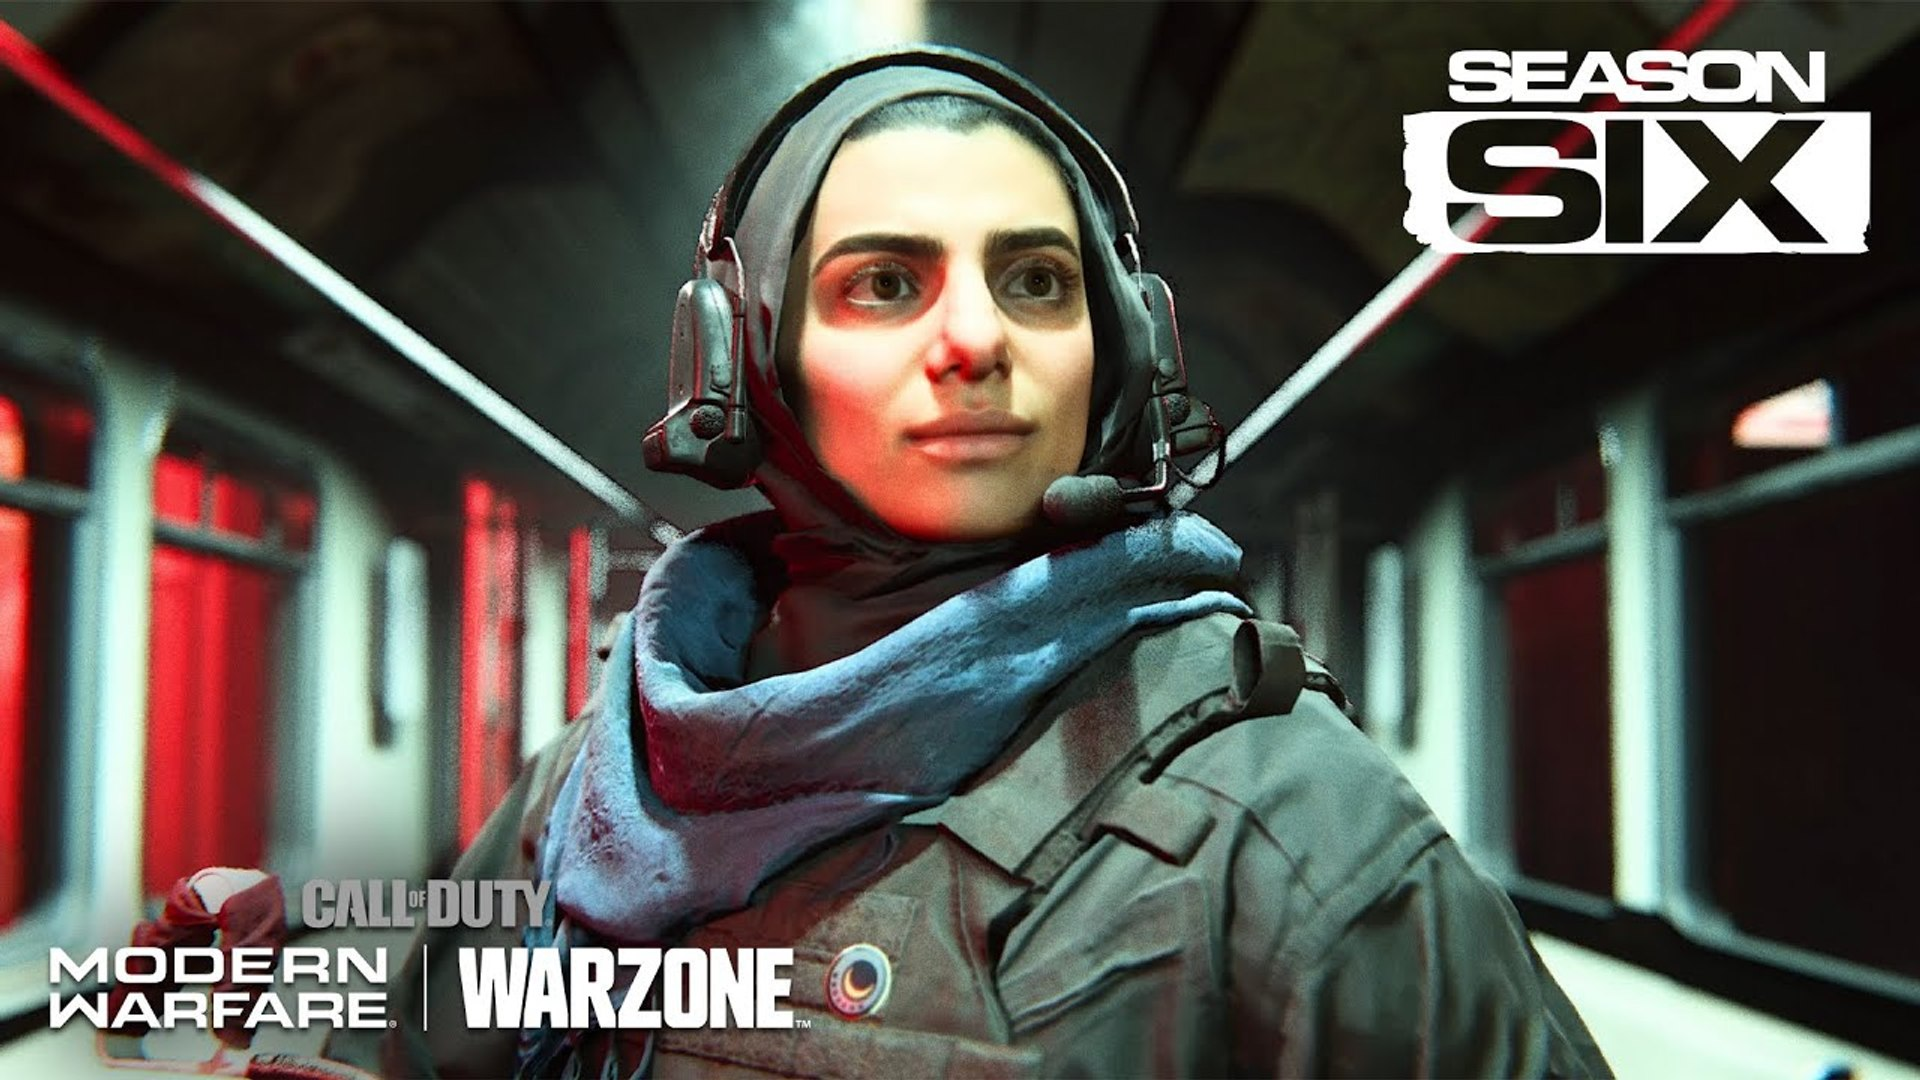 Call Of Duty Modern Warfare Warzone Season Six Cinematic Video Dailymotion